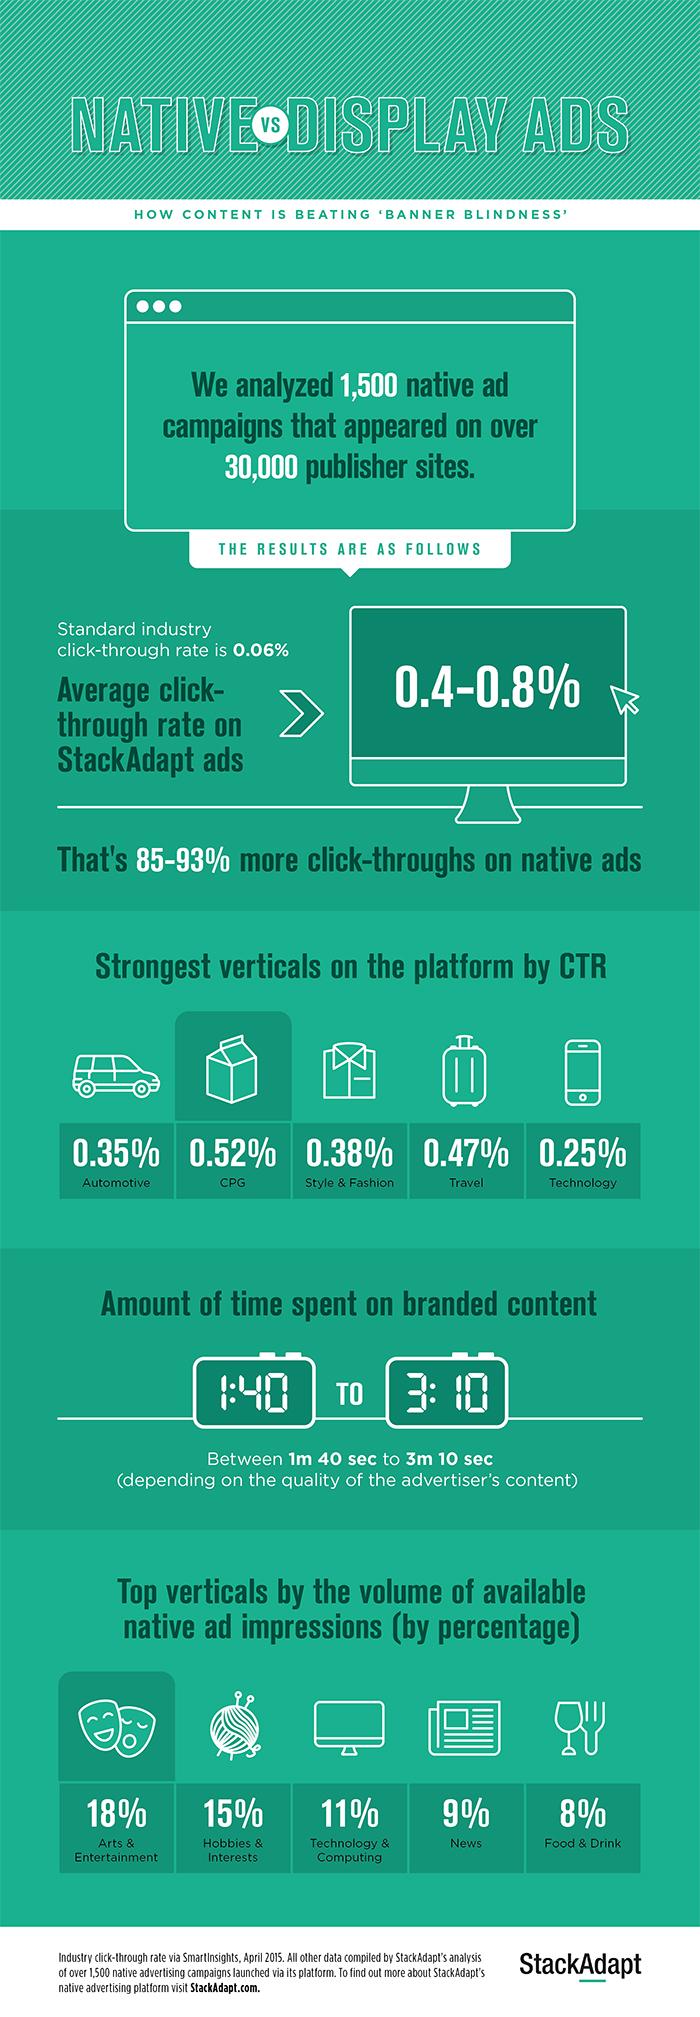 StackAdapt-Infographic